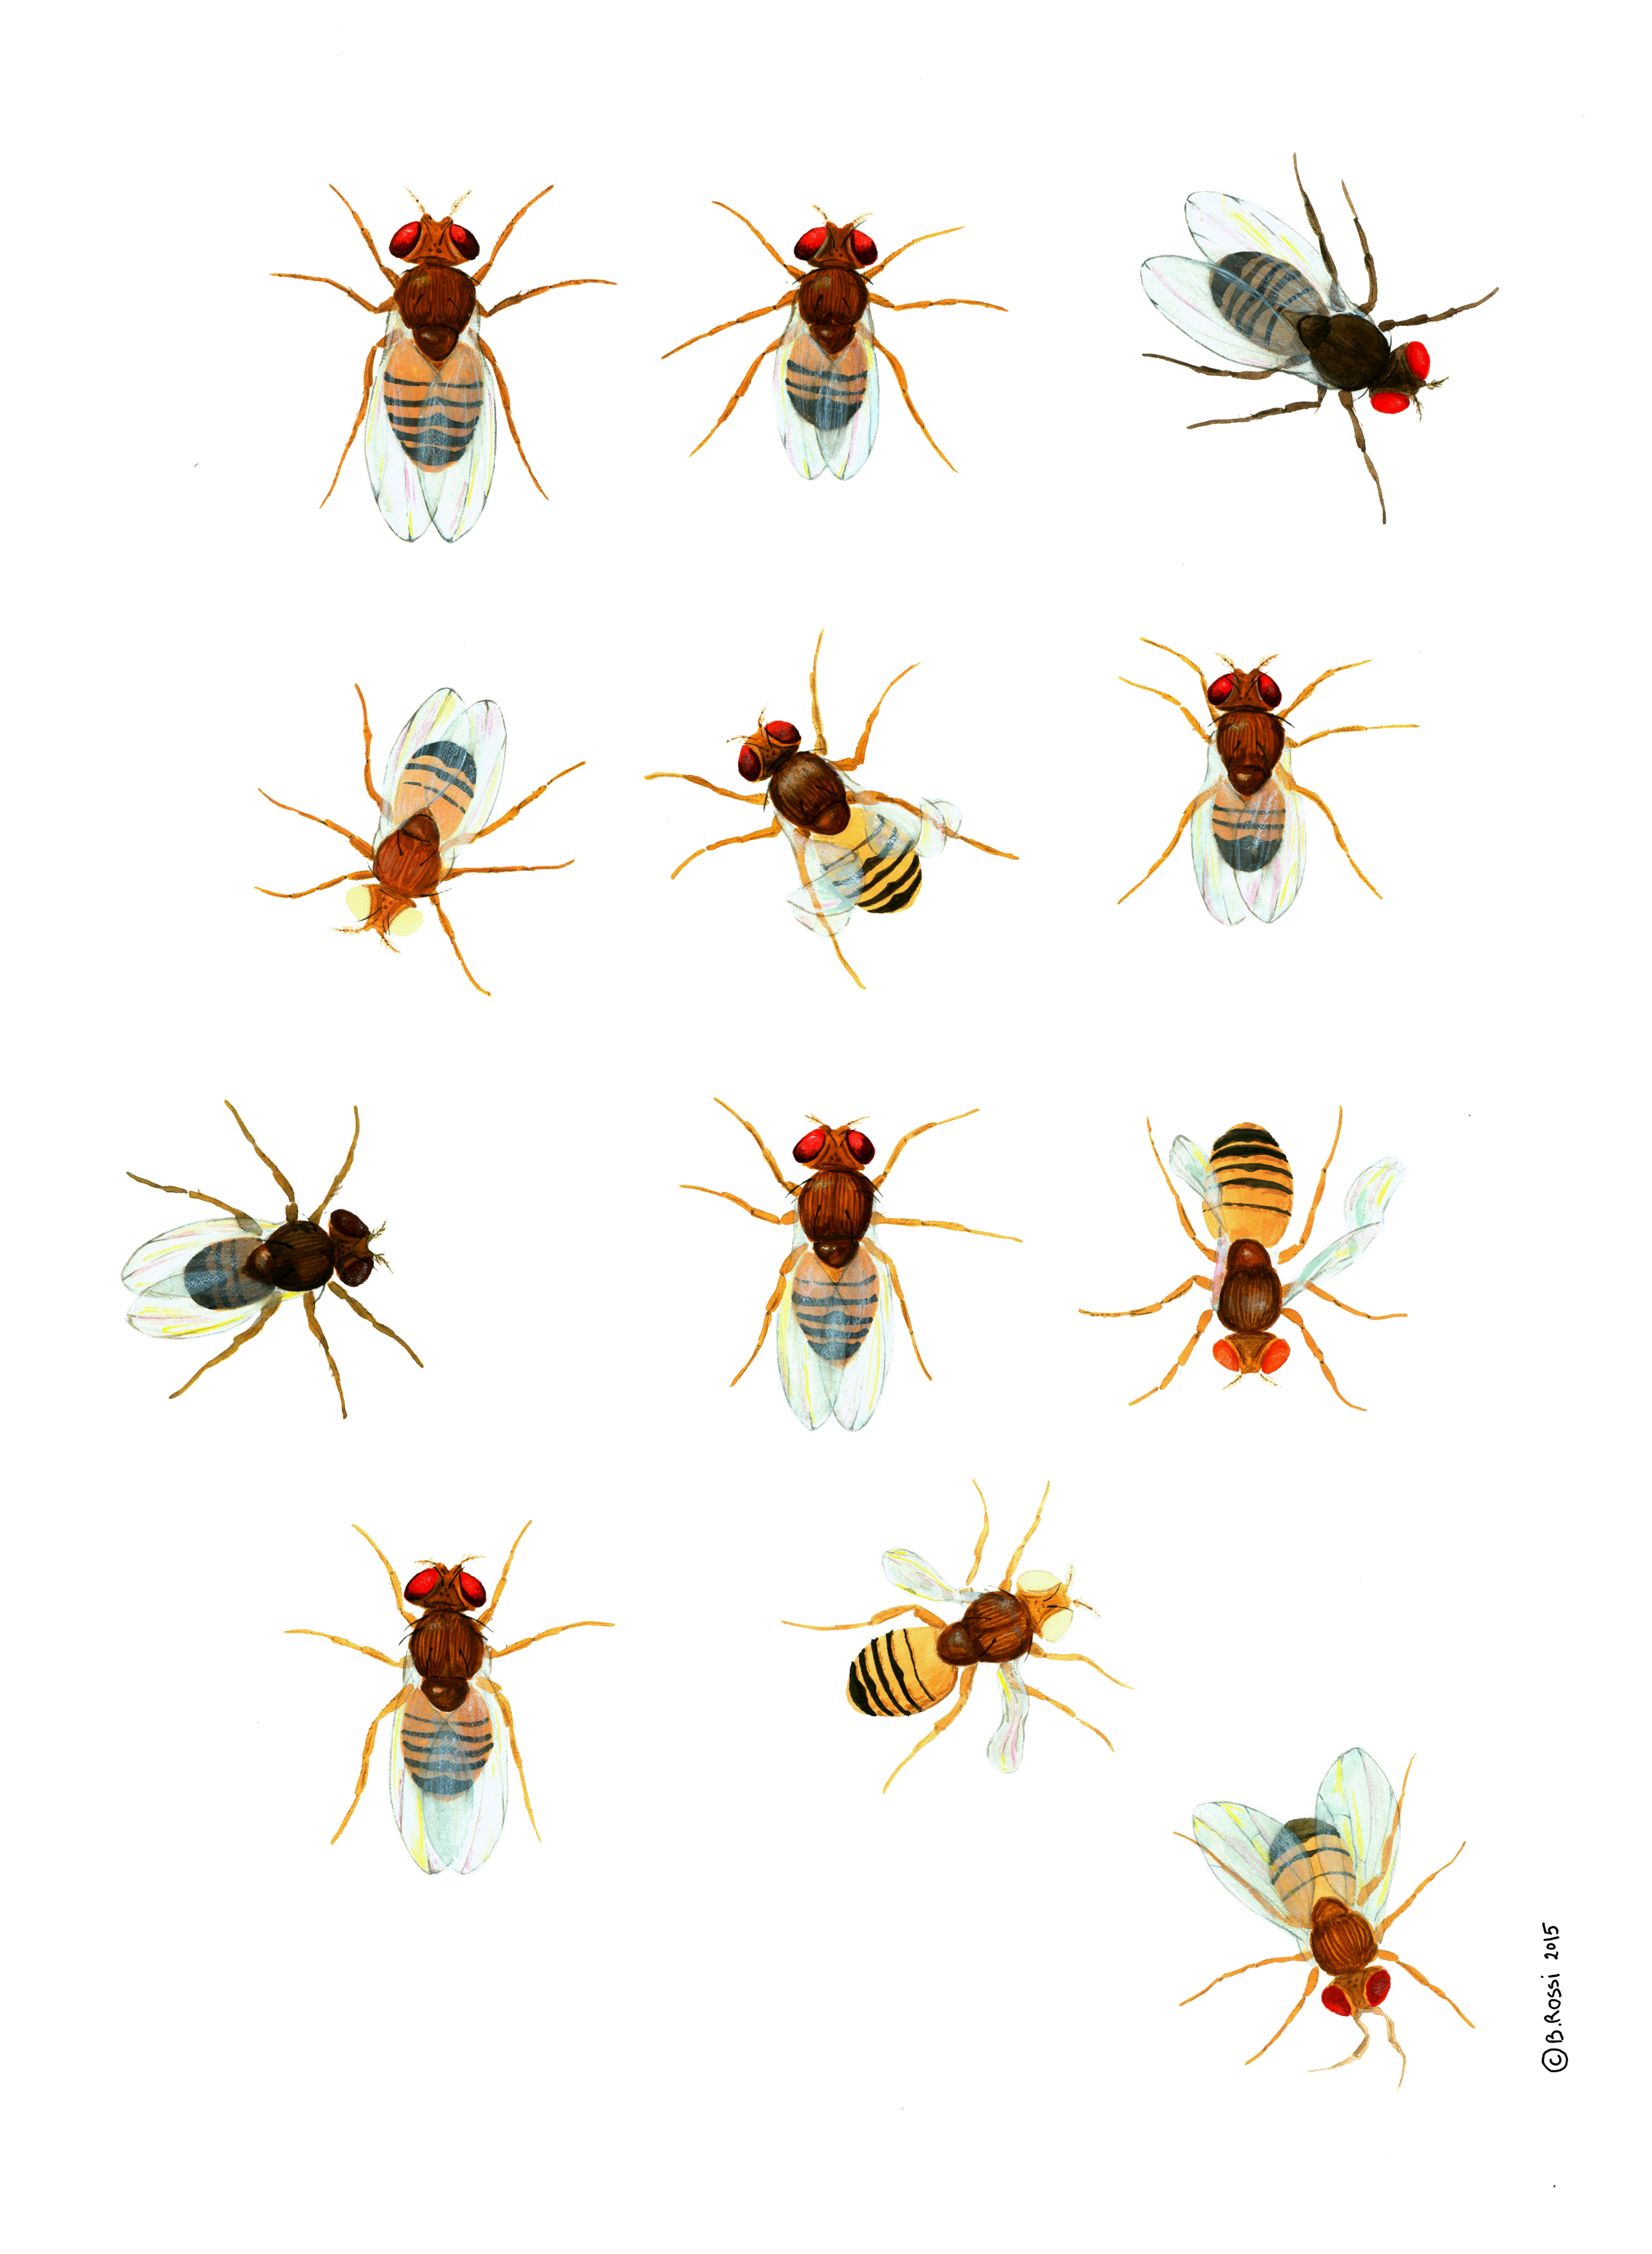 'Drosophila' by Benedicte Rossi